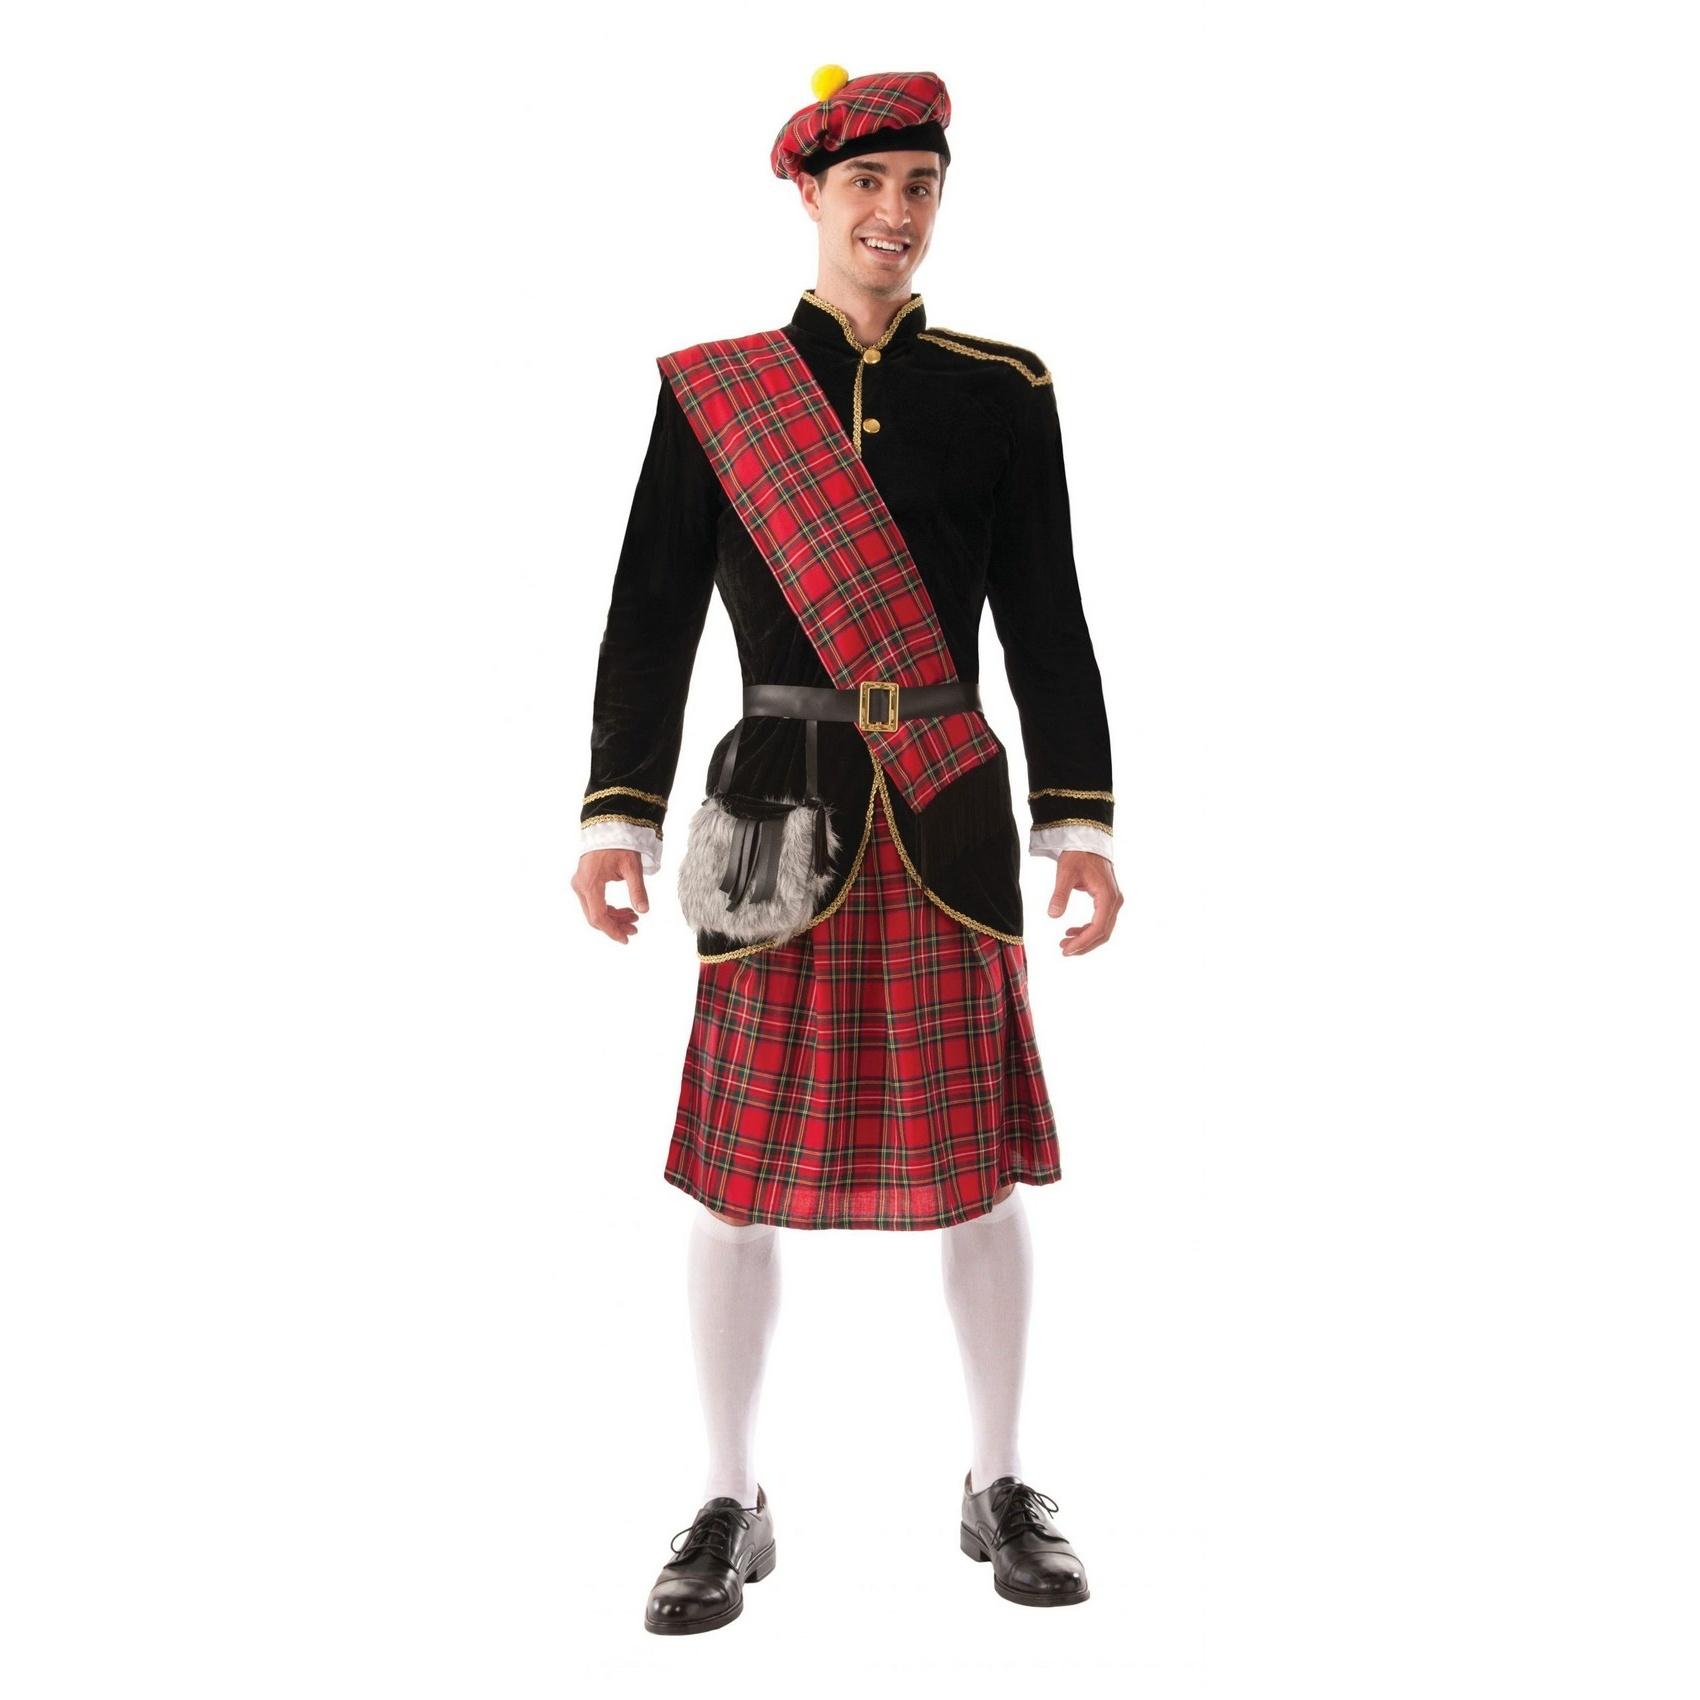 Bristol Novelty Mens Scotsman Costume (One Size) (Red/Black)